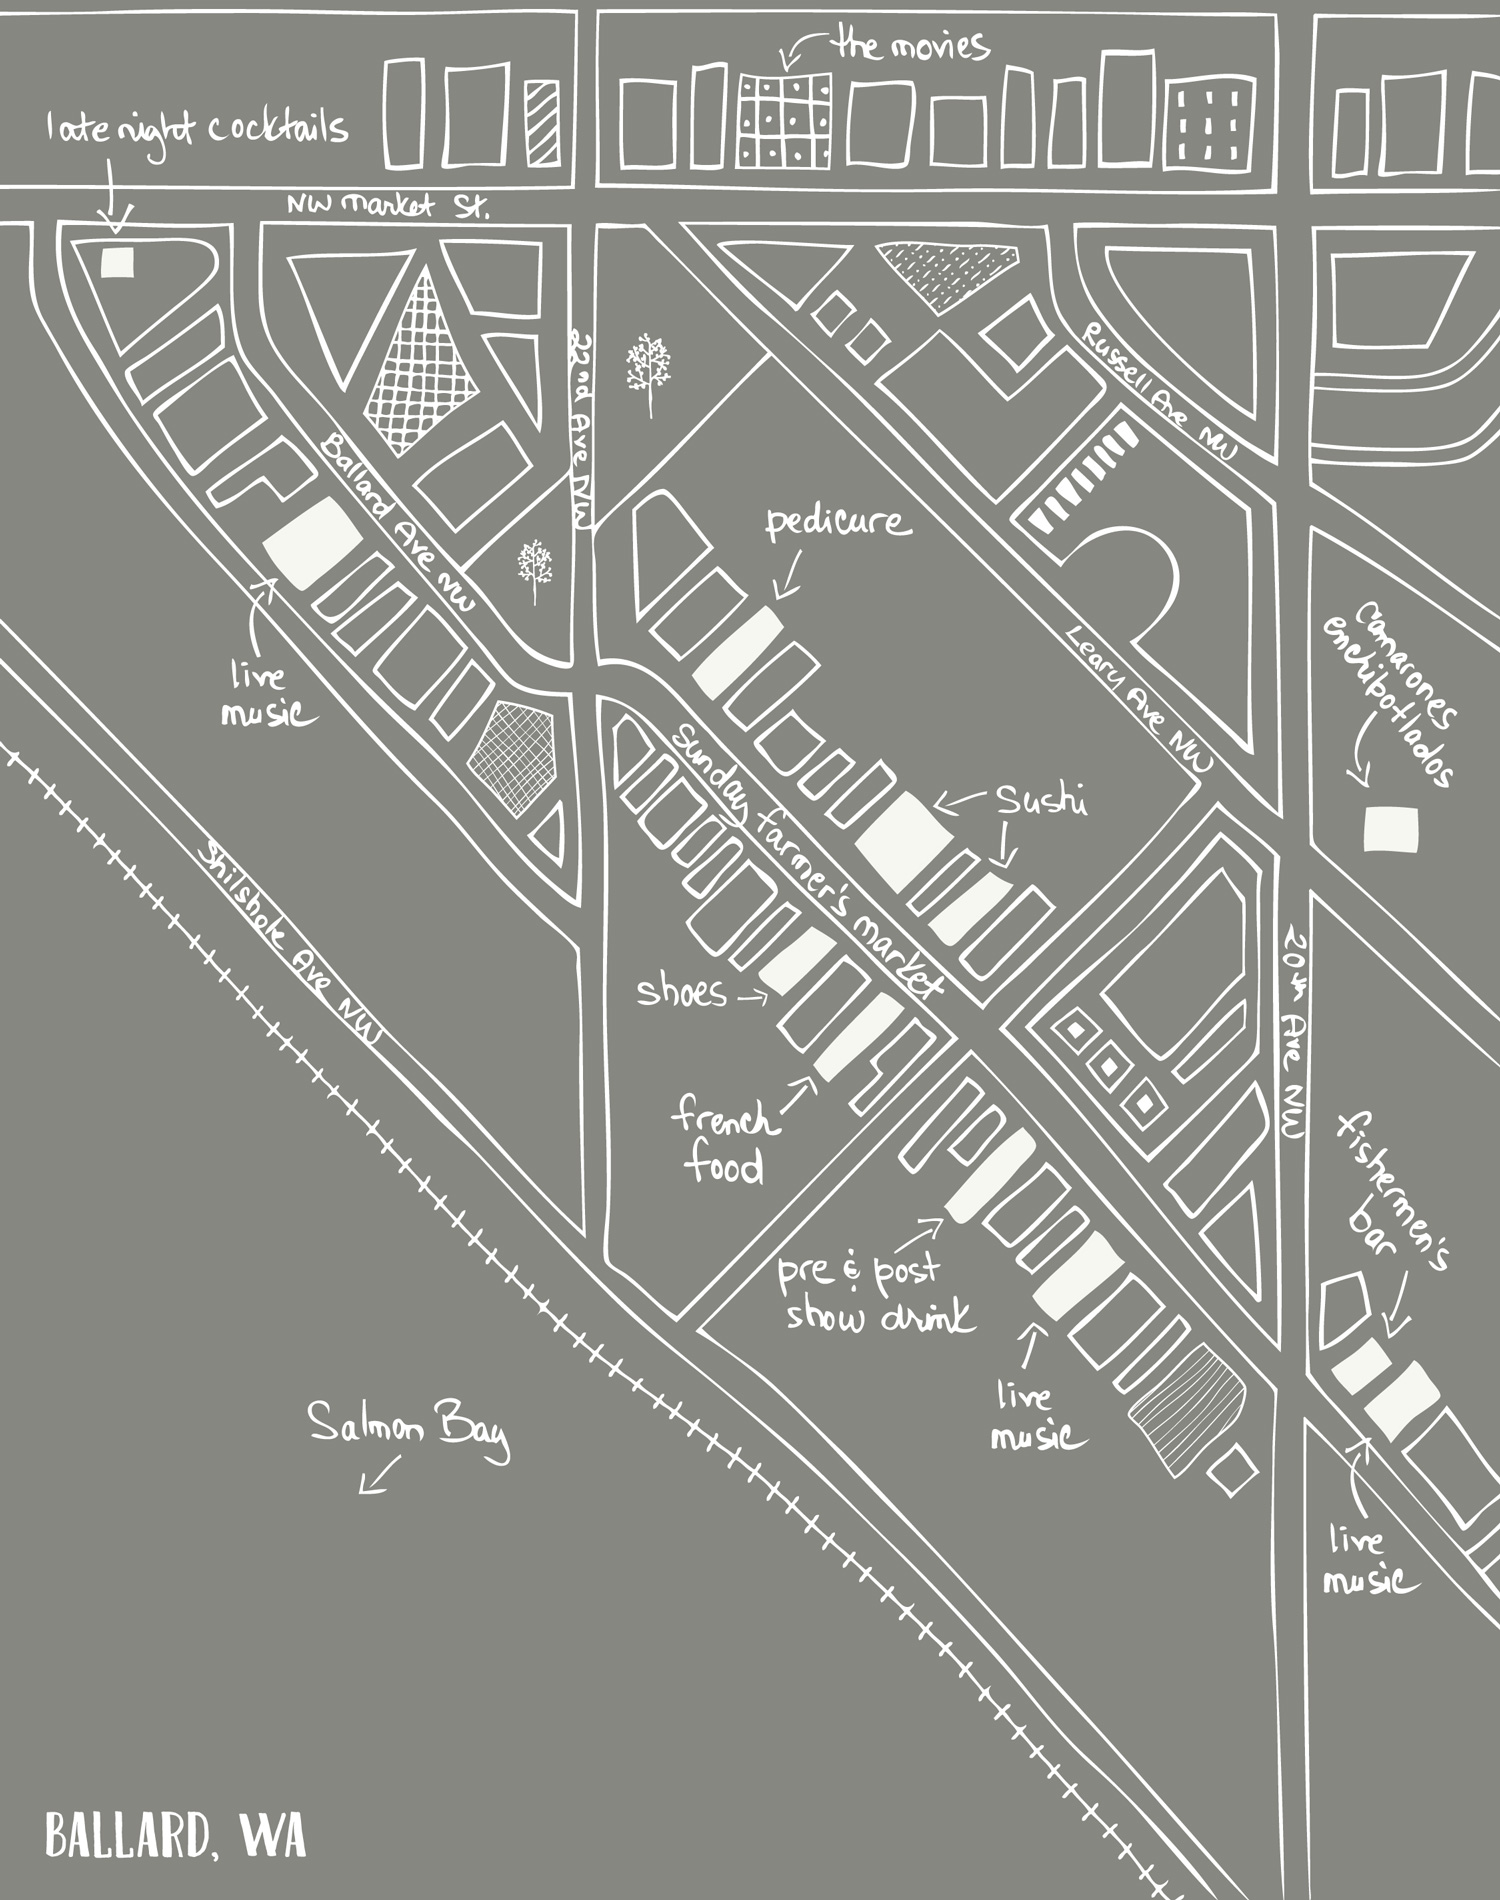 Map of Ballard neighborhood, Seattle, WA by Laurie Baars